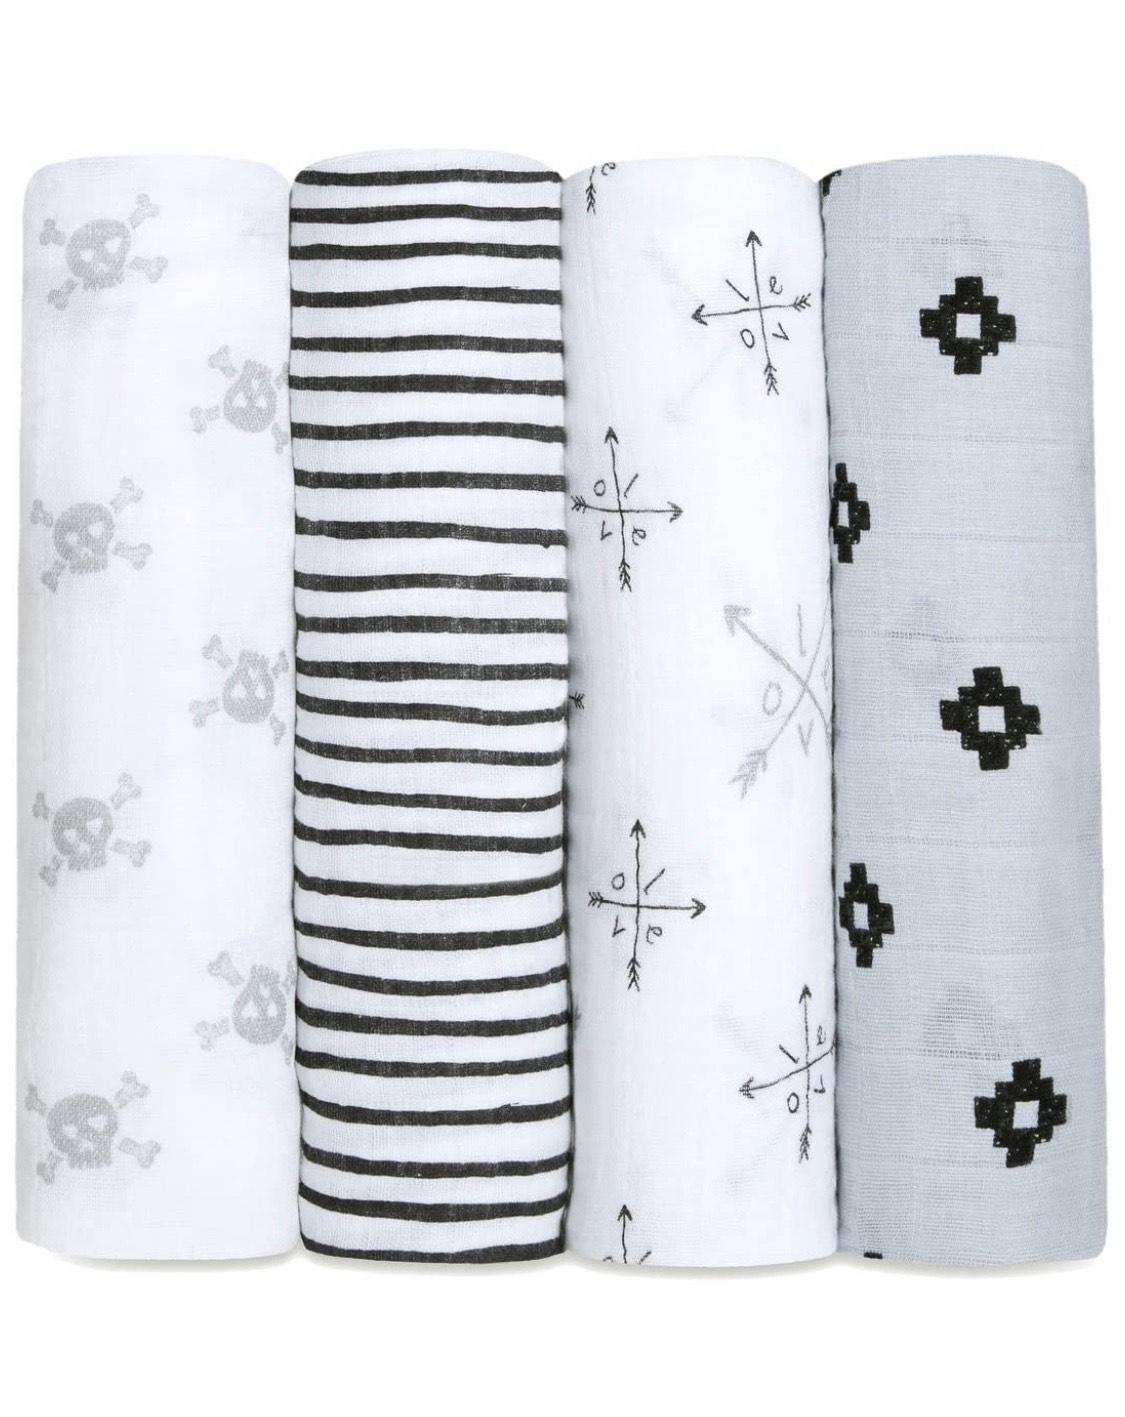 aden + anais 100% cotton muslin swaddles lovestruck 120 x 120cm 4 pack - £31.90 @ Amazon